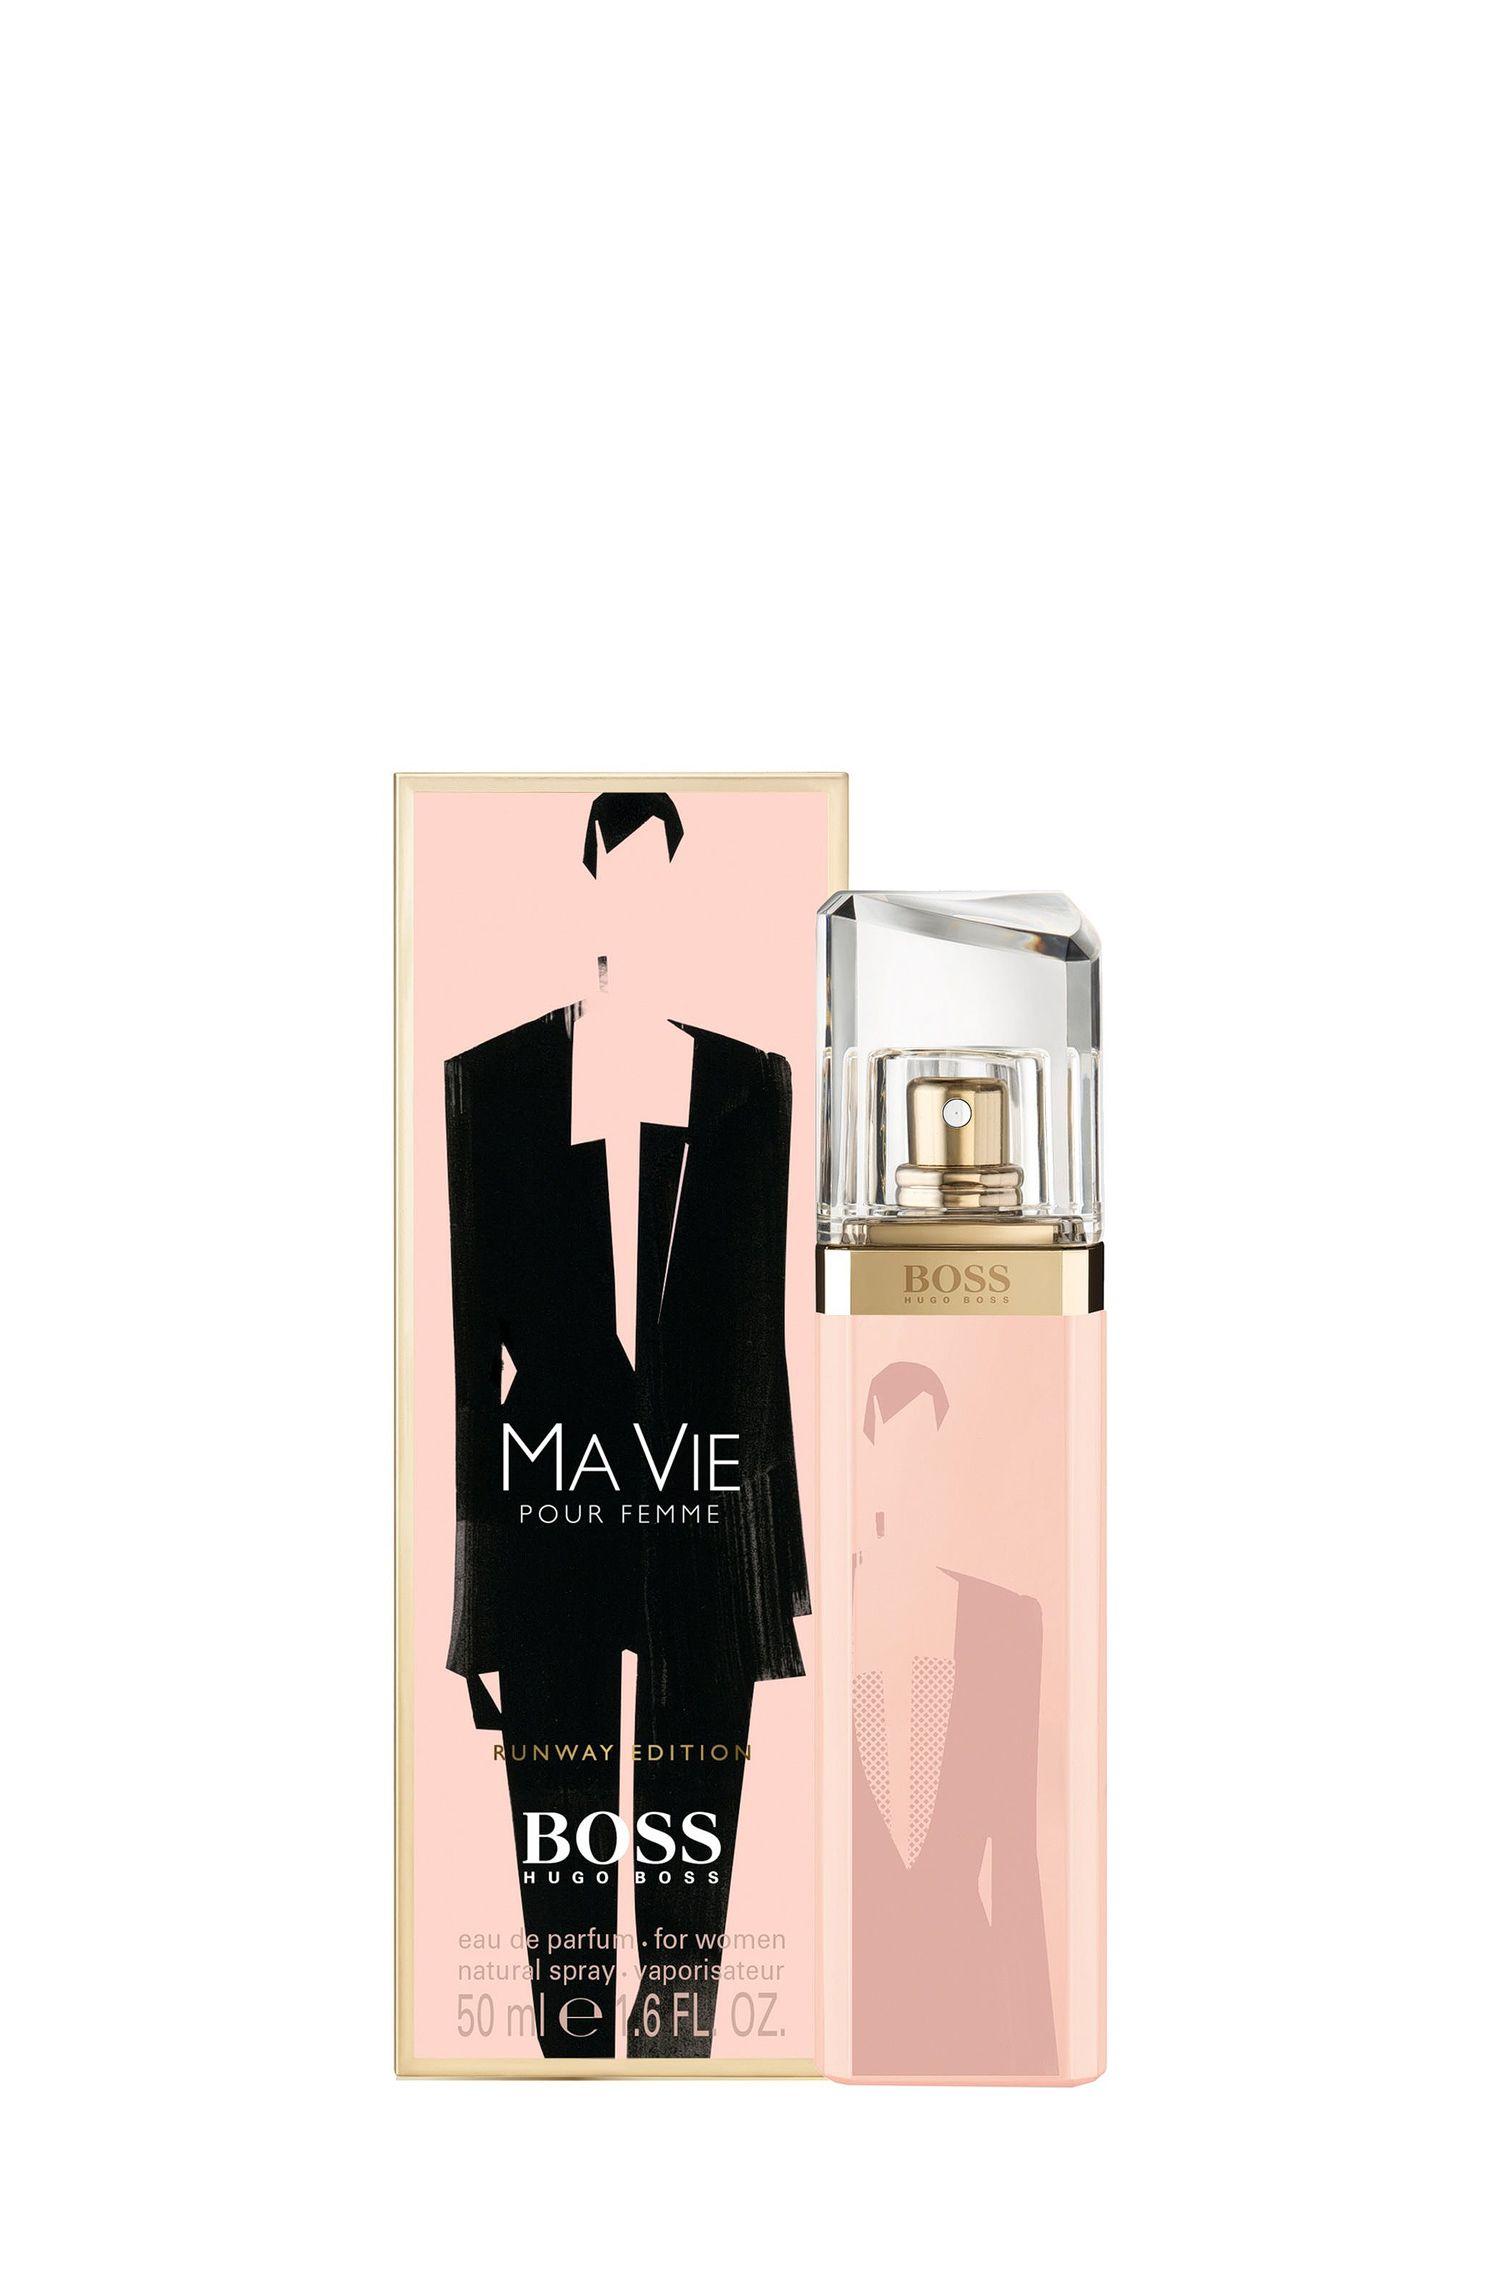 'BOSS Ma Vie Runway Edition' eau de parfum 50ml